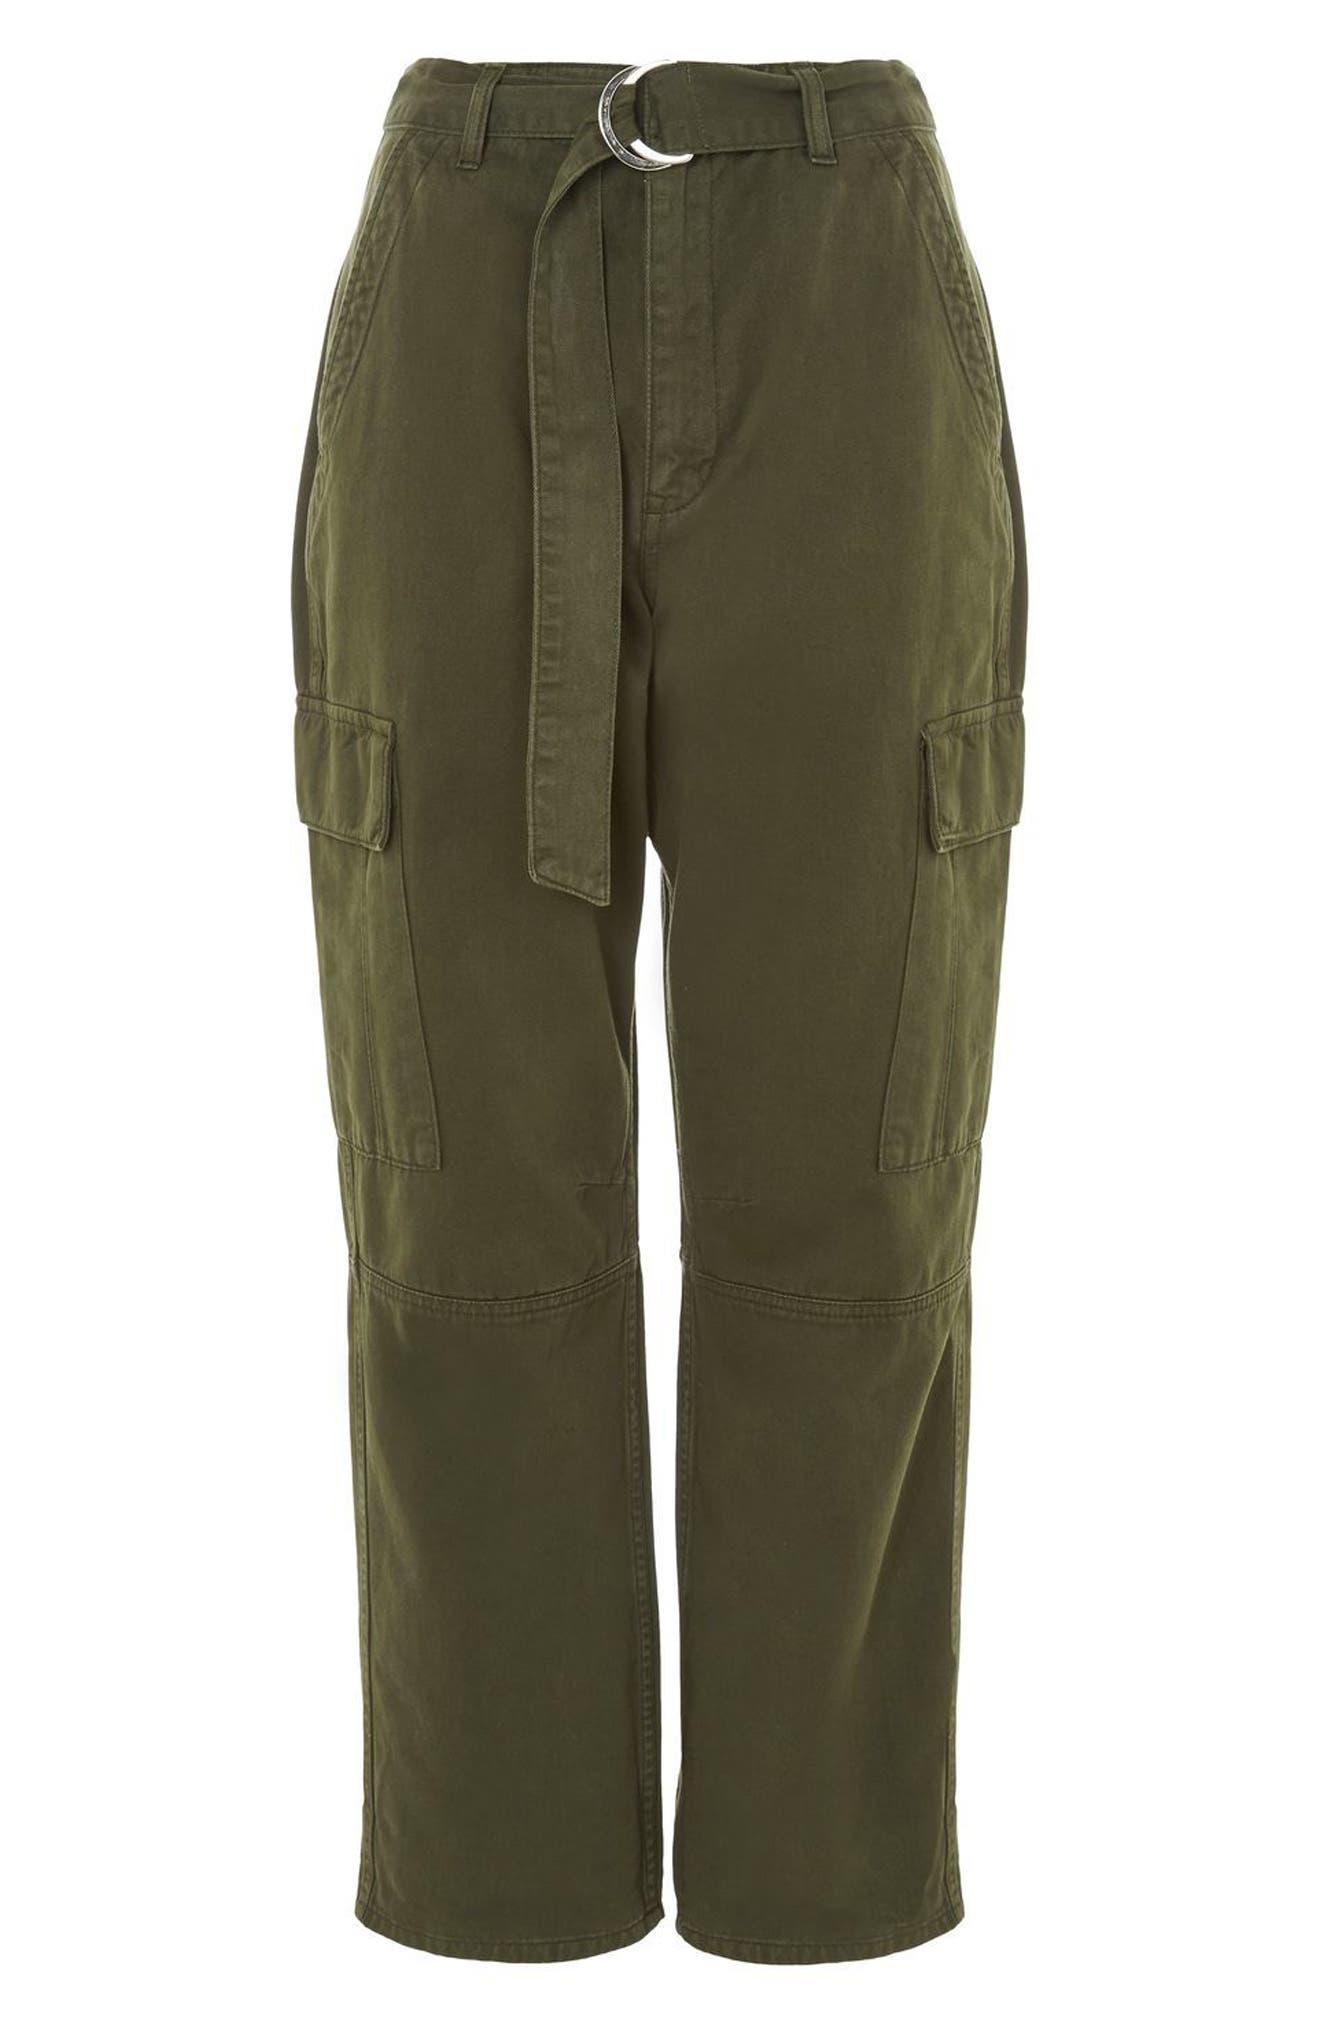 Combat Pocket Utility Trousers,                             Alternate thumbnail 3, color,                             310